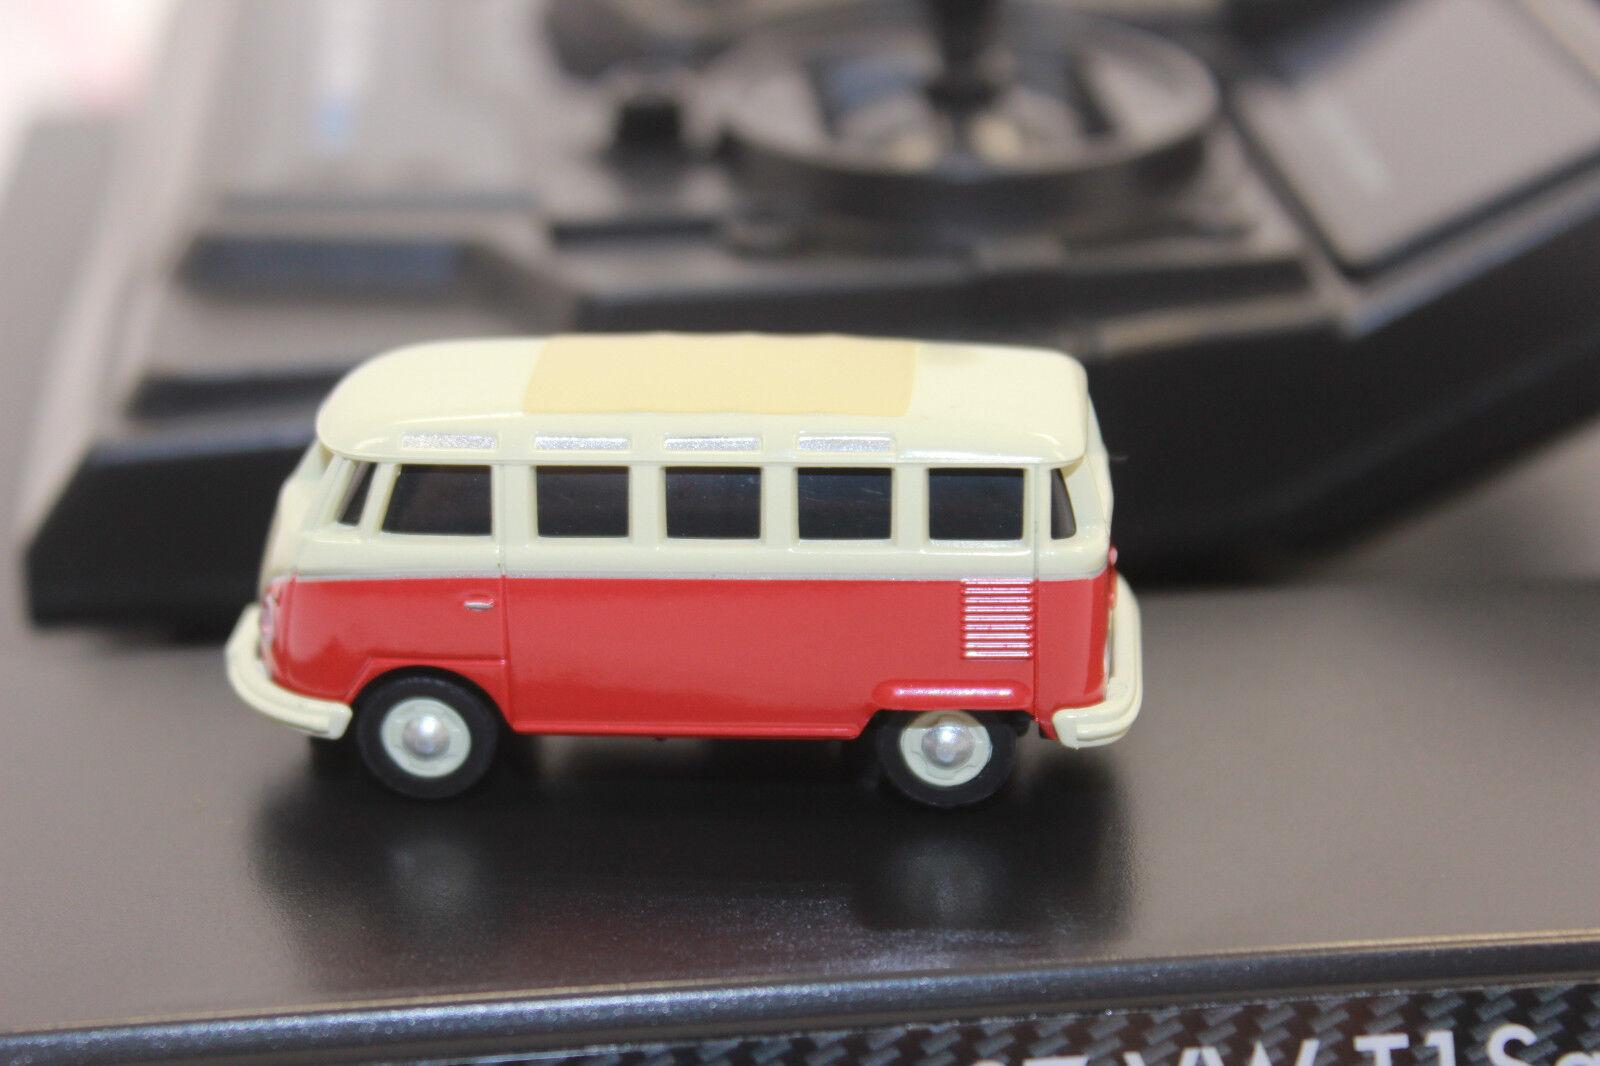 Carson 500504119 VW T1 Bus Samba 2.4 GHZ RC Model 1 87 100% RTR NIP